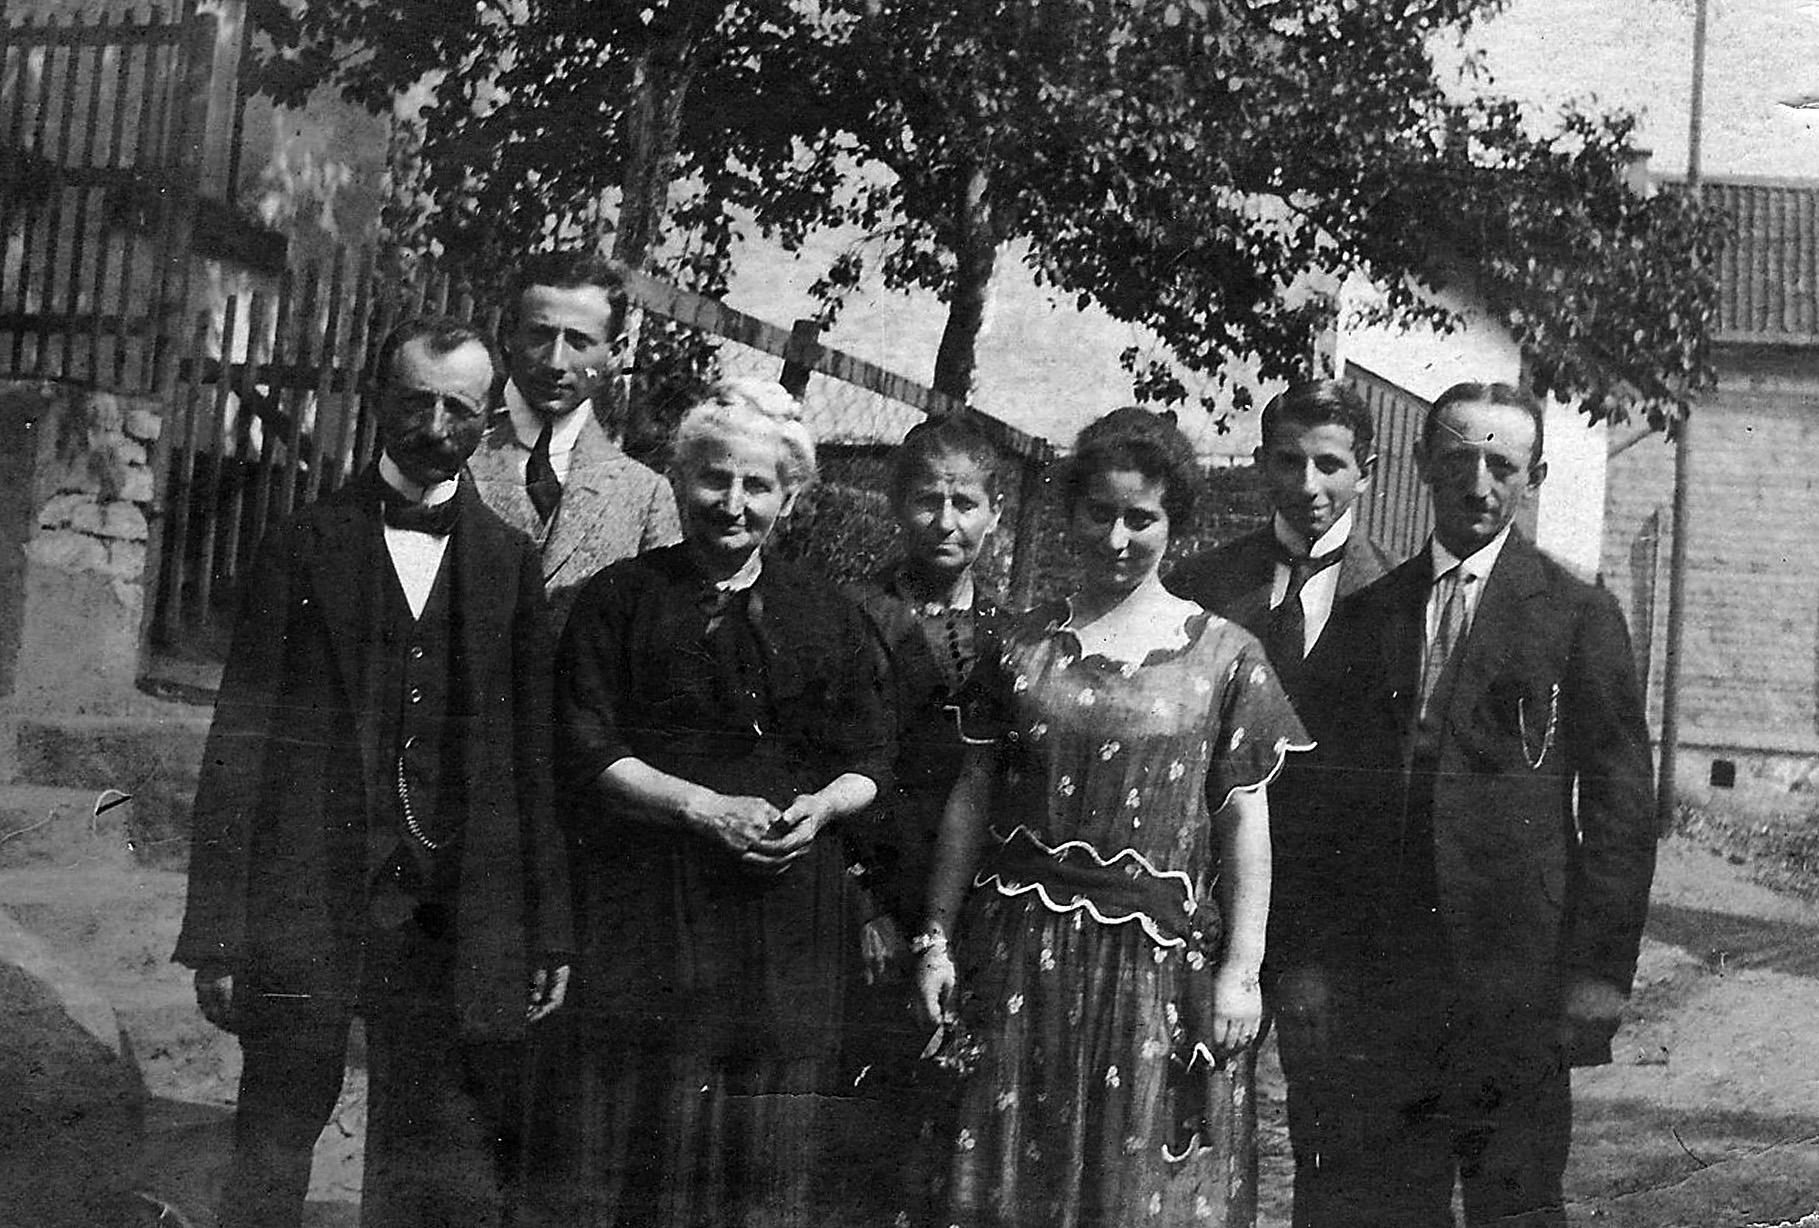 Familie Tobias, Hamm/Sieg